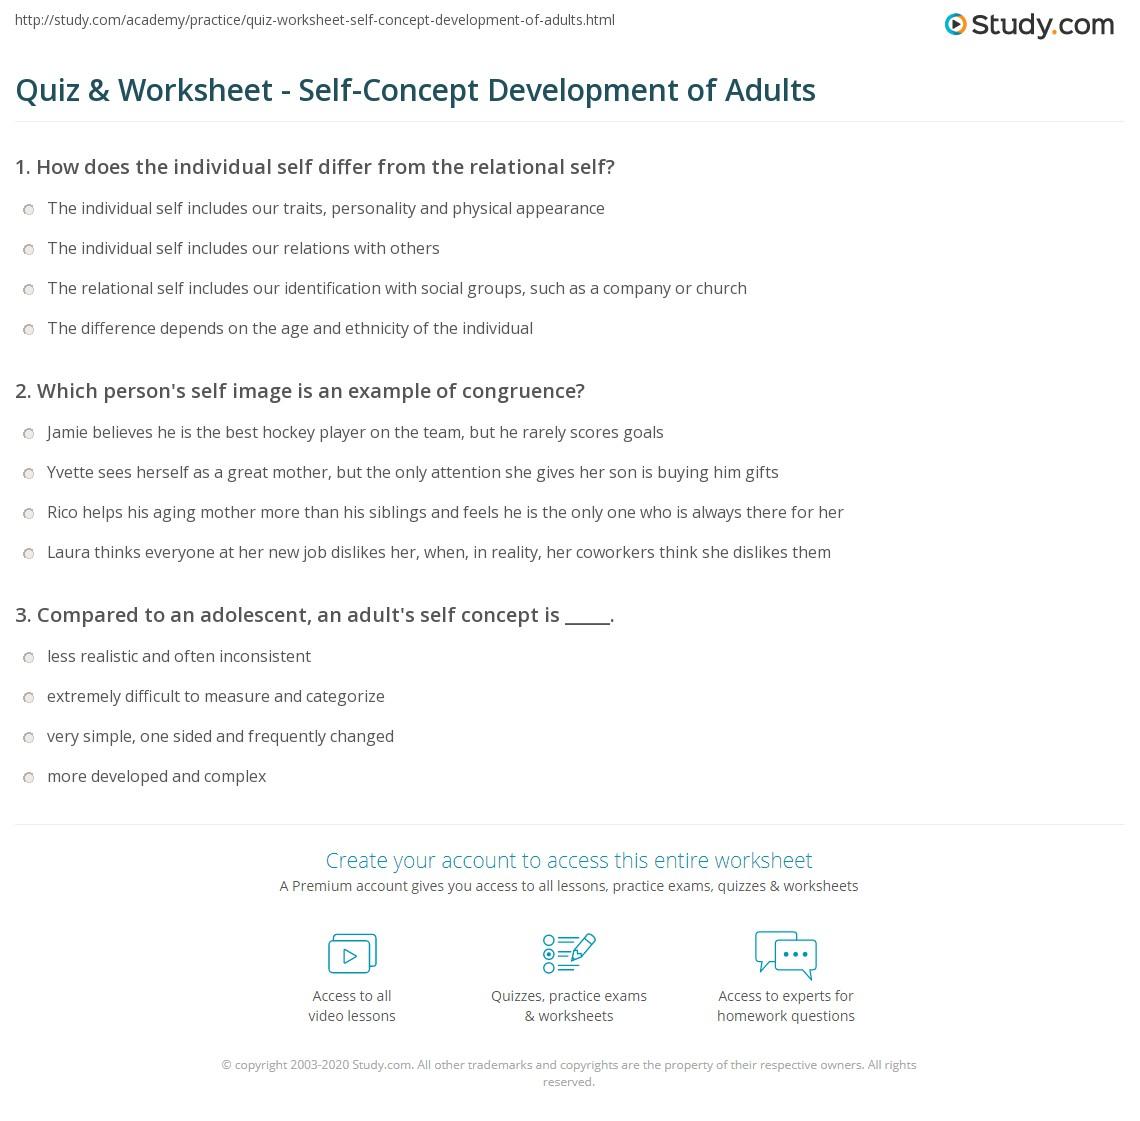 Quiz & Worksheet - Self-Concept Development of Adults | Study com